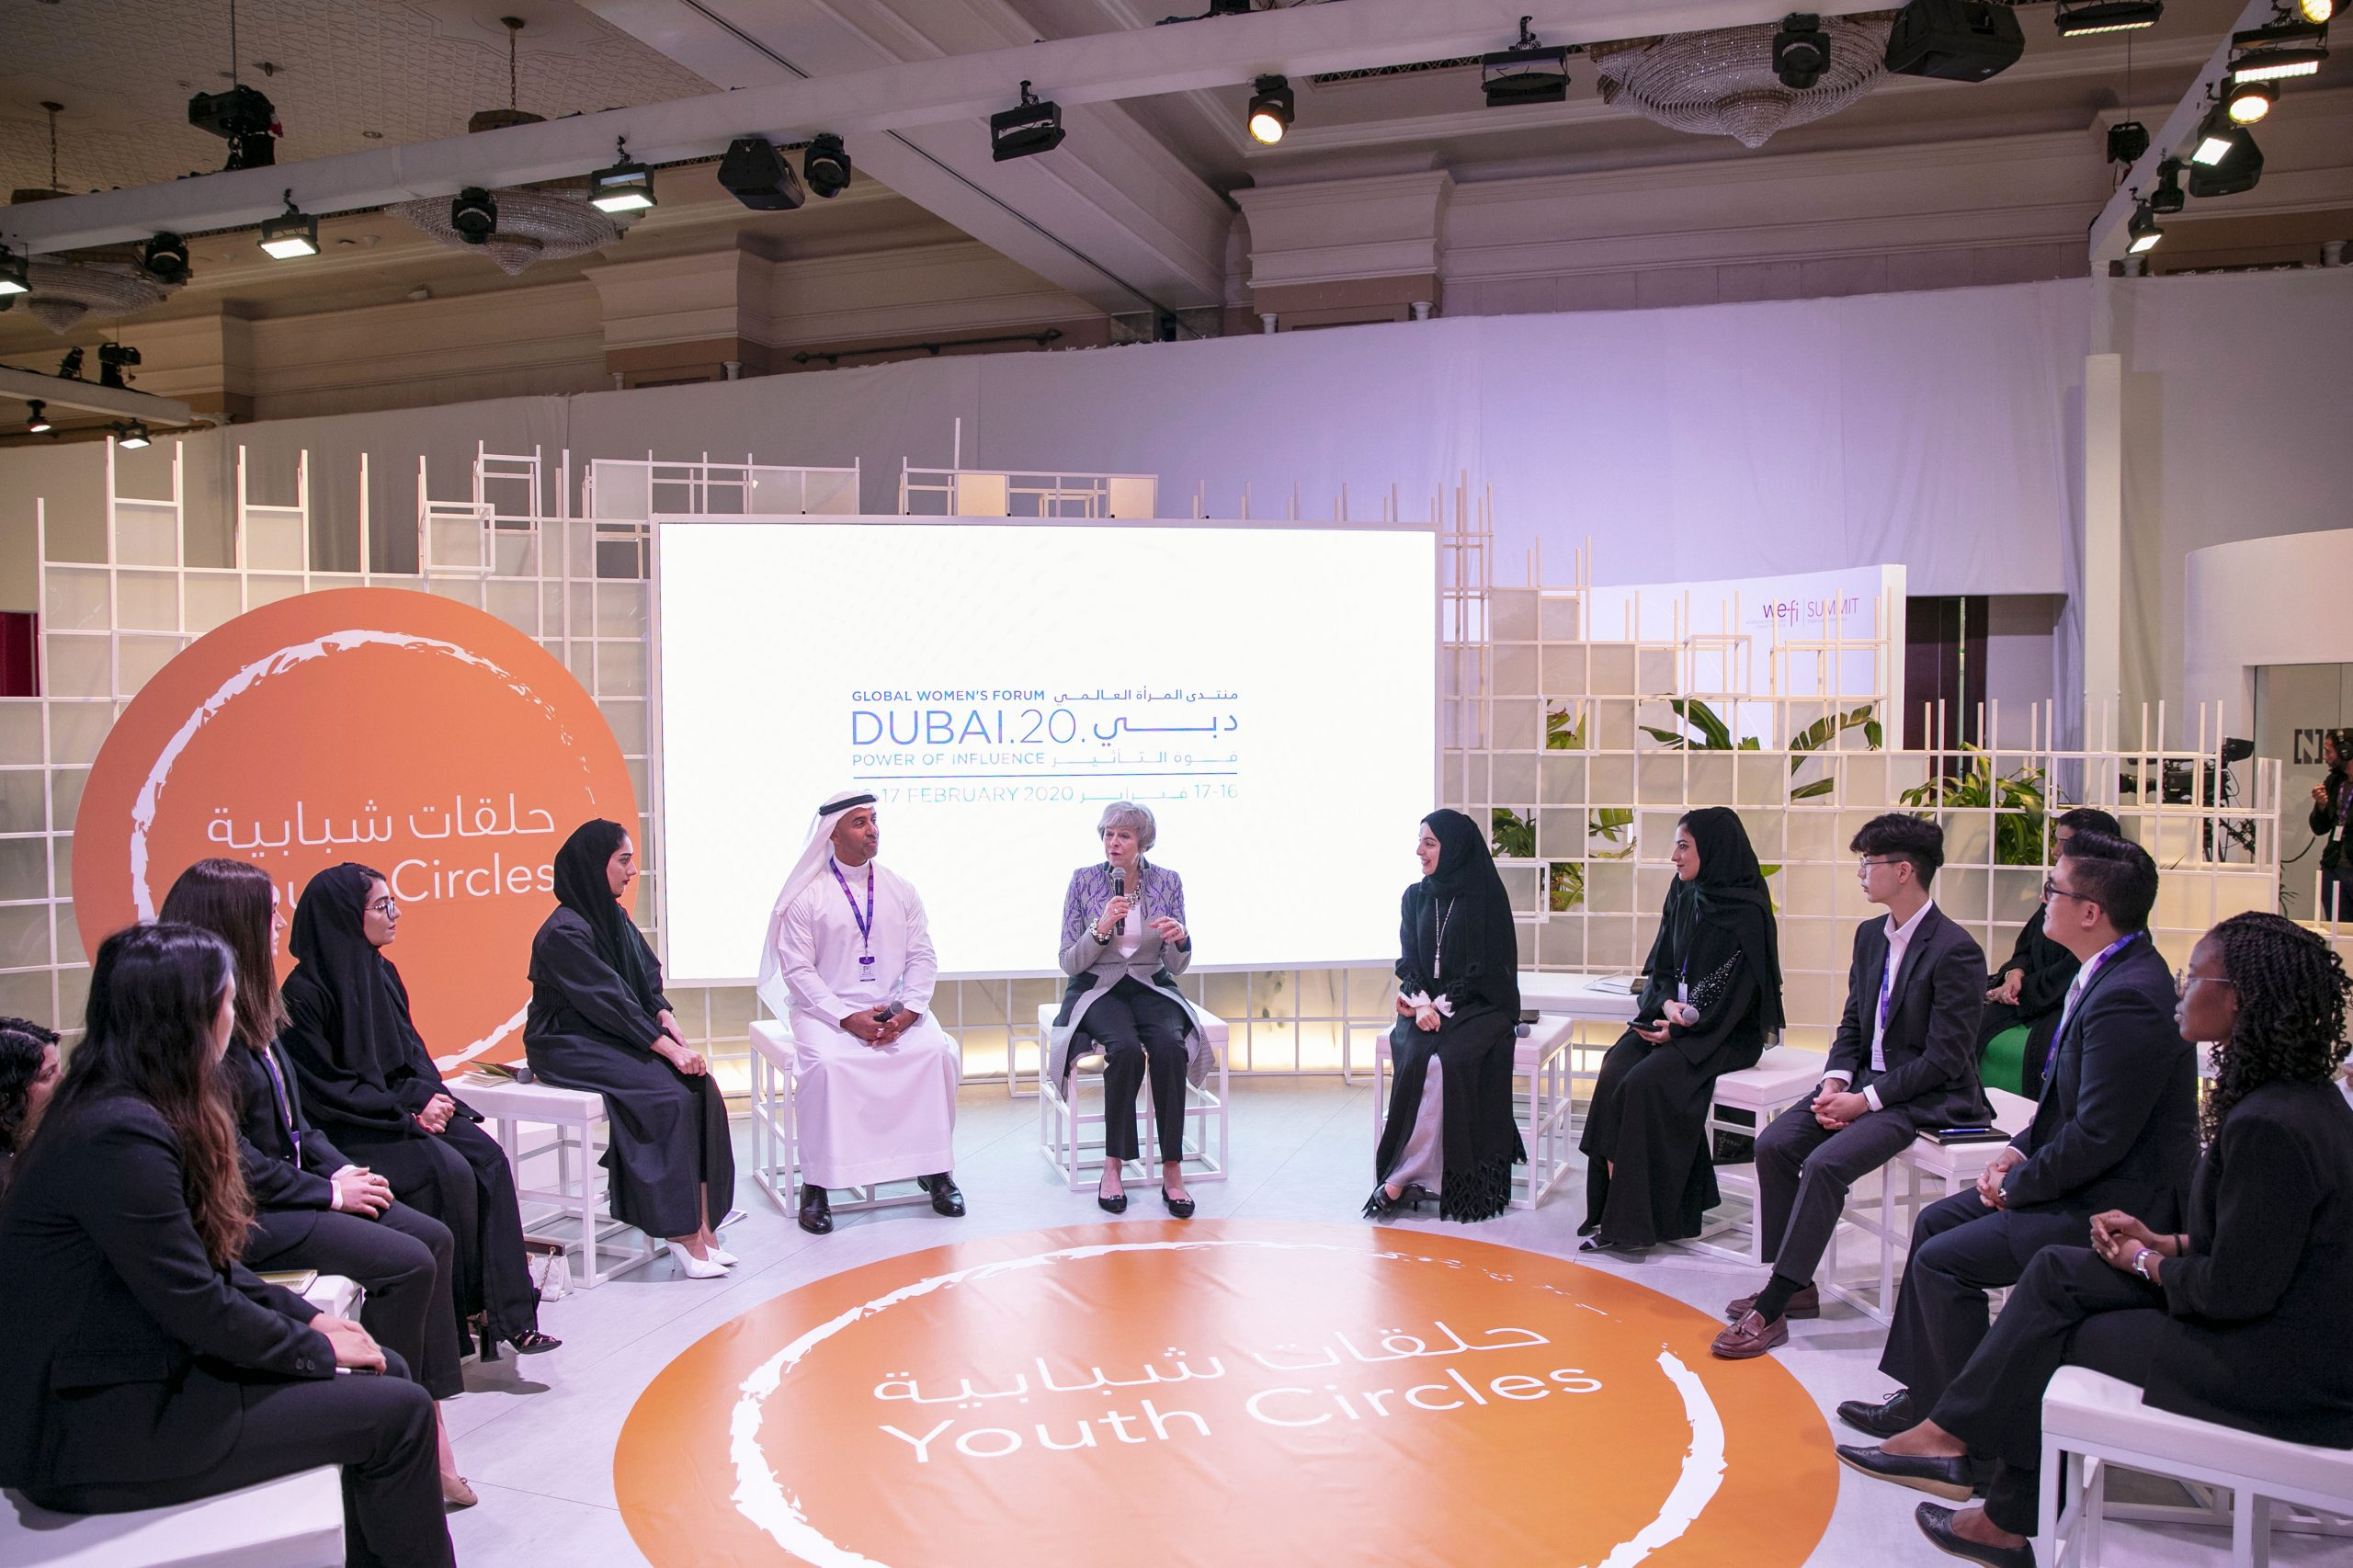 Rt. Hon Theresa May participates in Youth Circle at Global Women's Forum Dubai 2020